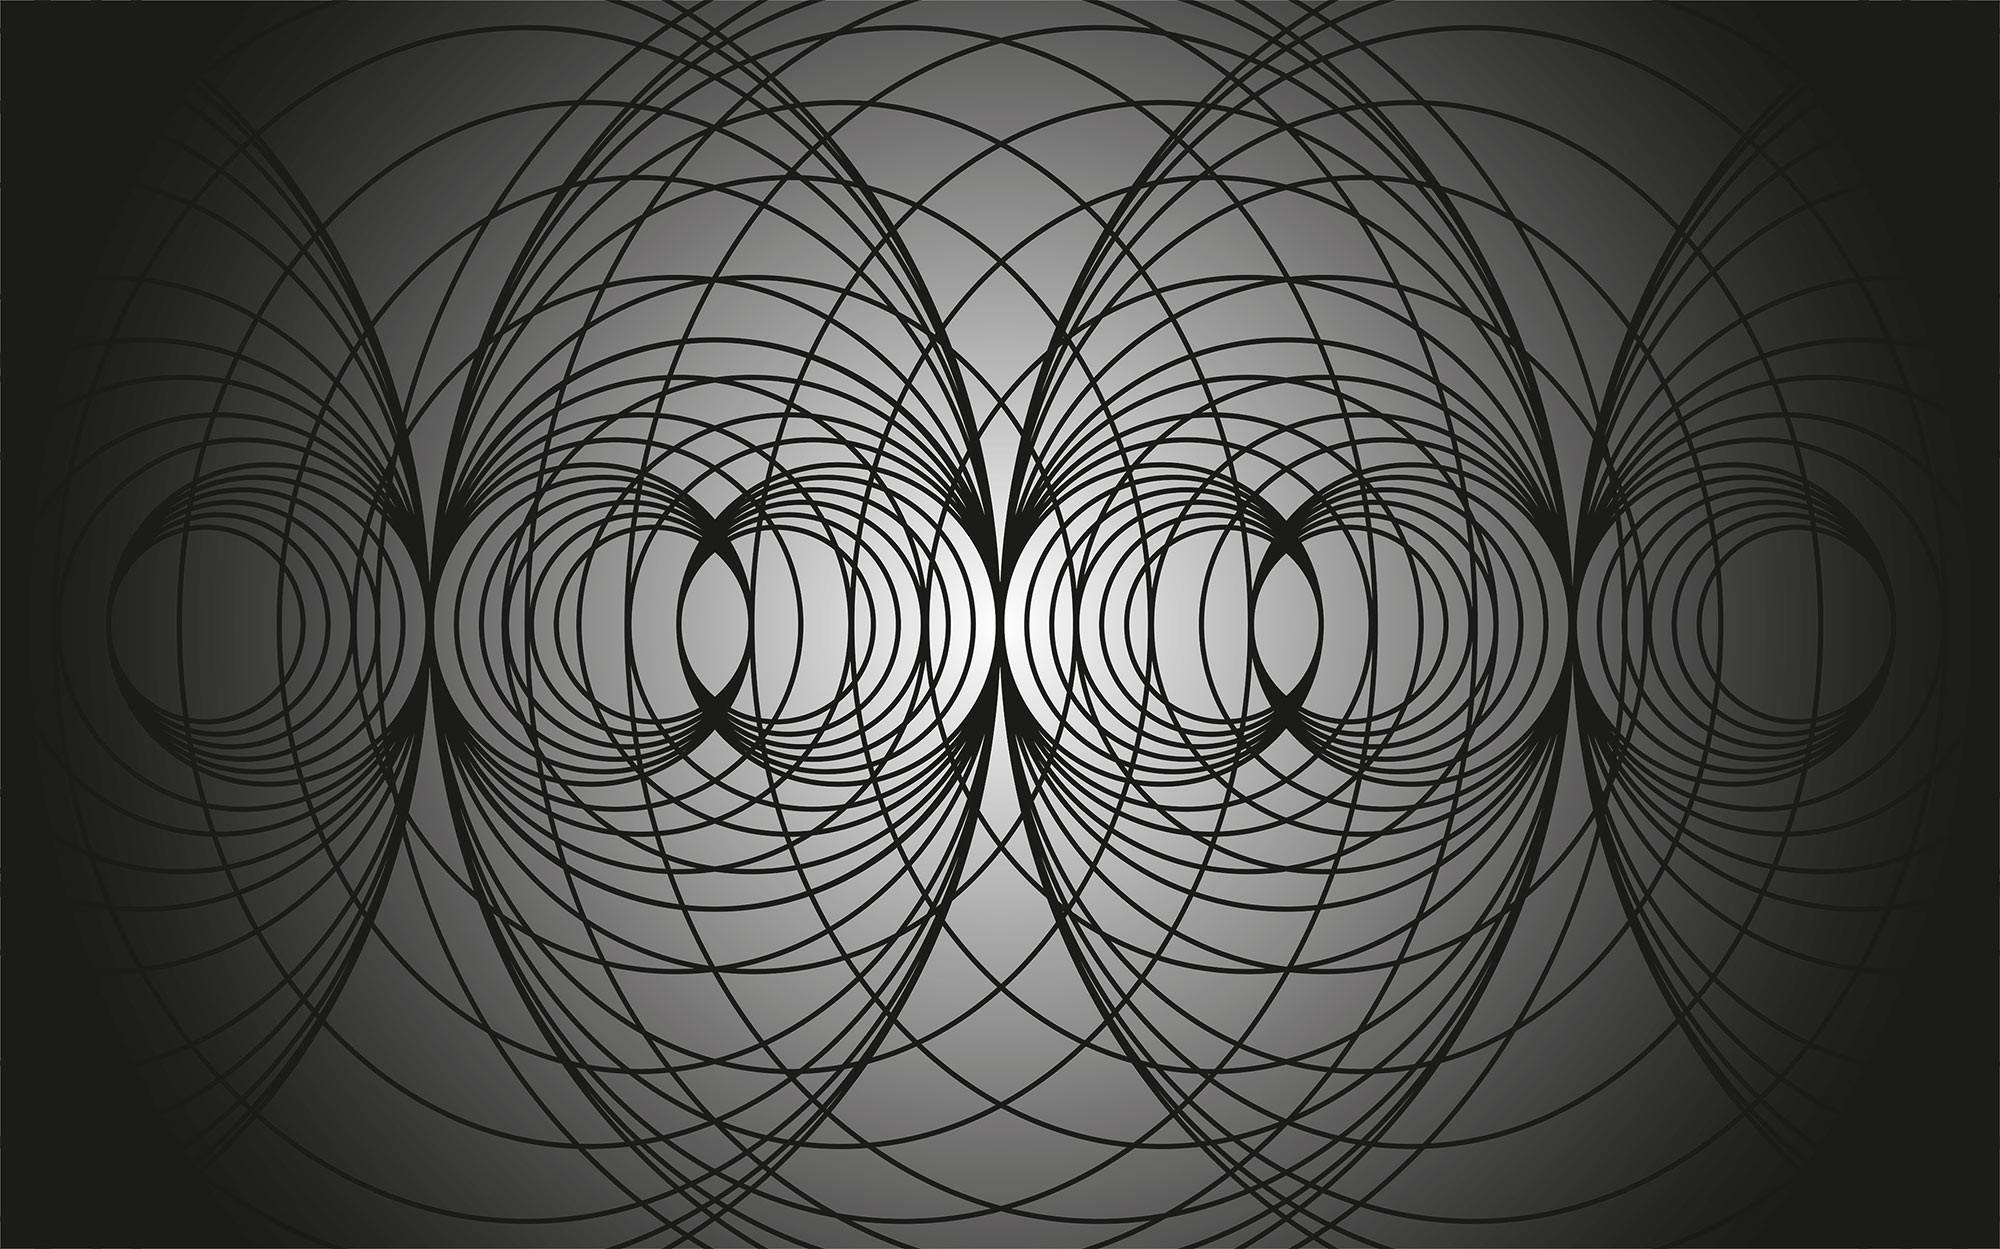 Infinite Glimpse Net black-grey-black